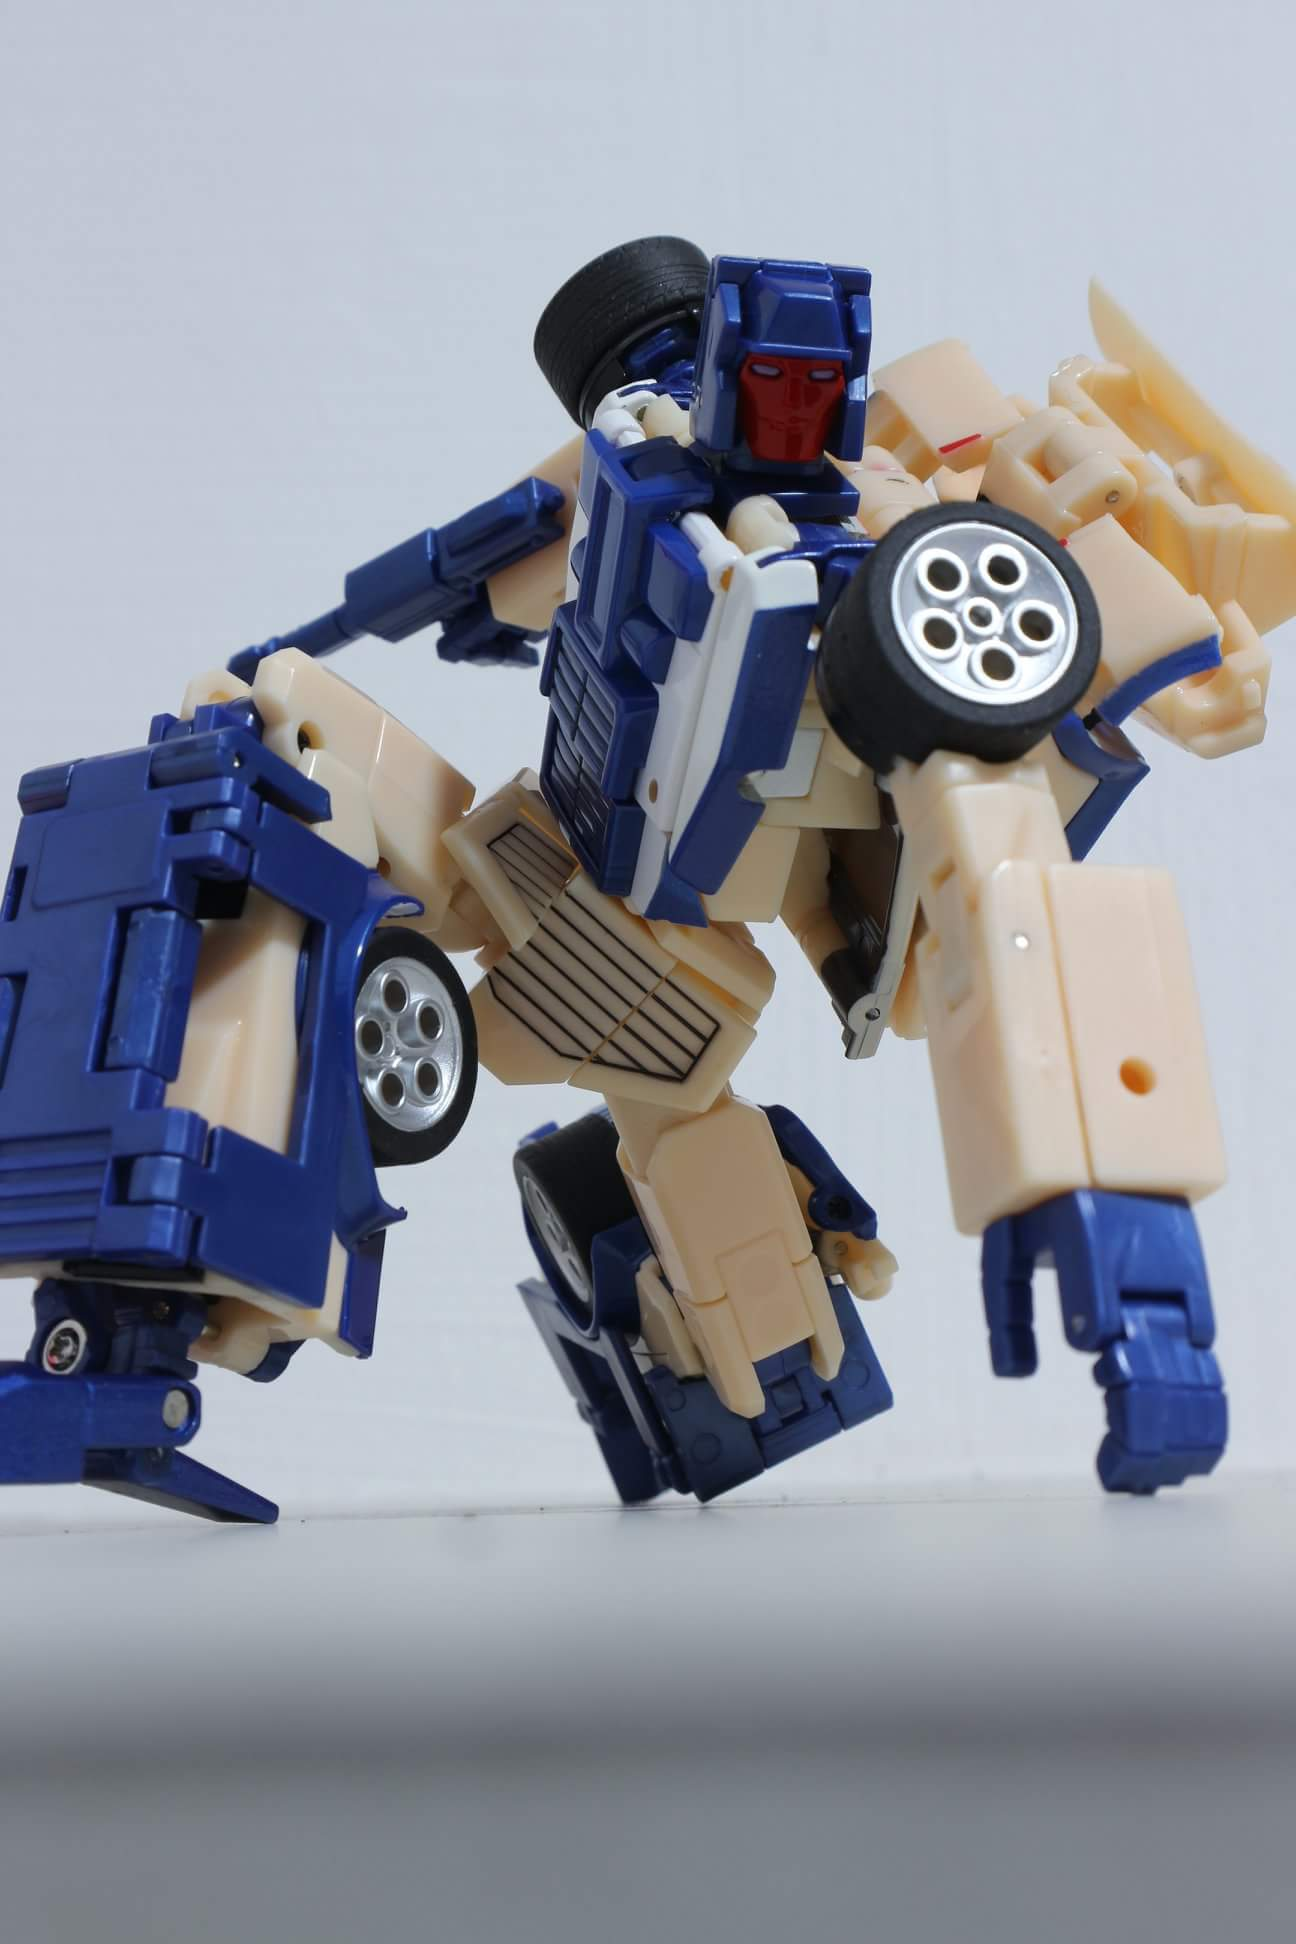 [X-Transbots] Produit Tiers - Jouets Berserkars forme Monolith (MX-XIII à MX-VII) - aka Stunticons forme Menasor/Menaseur - Page 2 JlXdJX2r_o